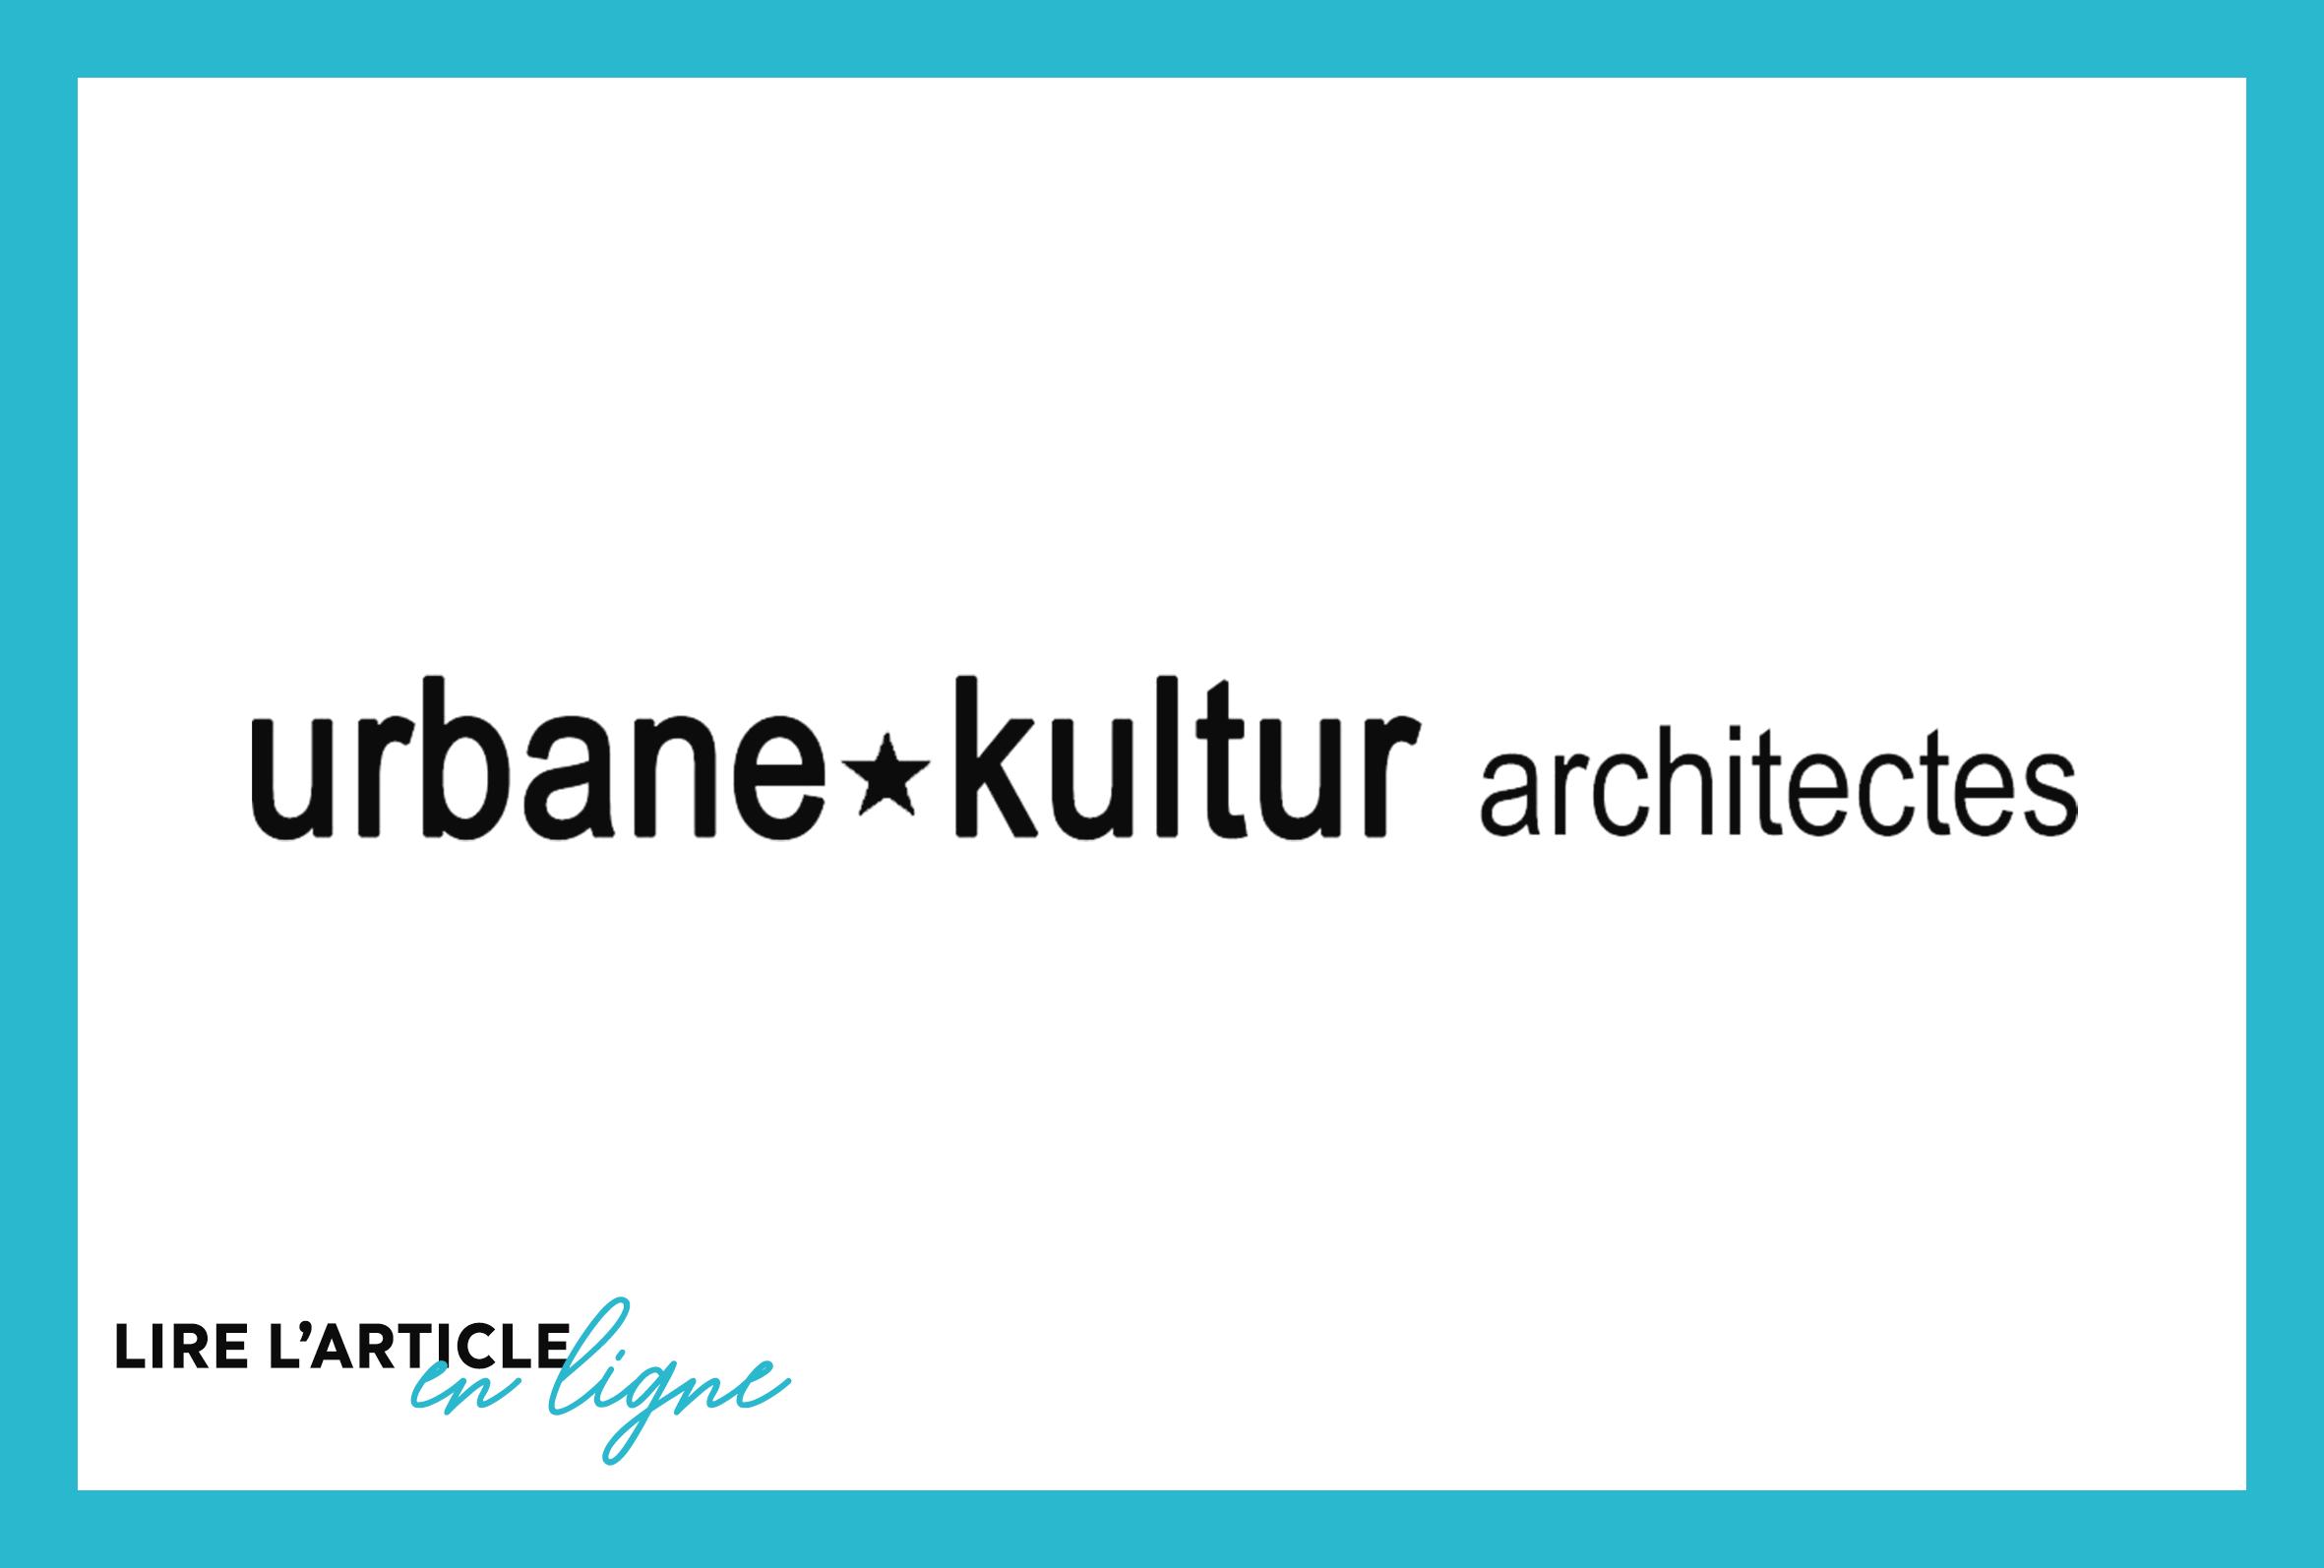 URBANE KULTUR ARCHITECTES